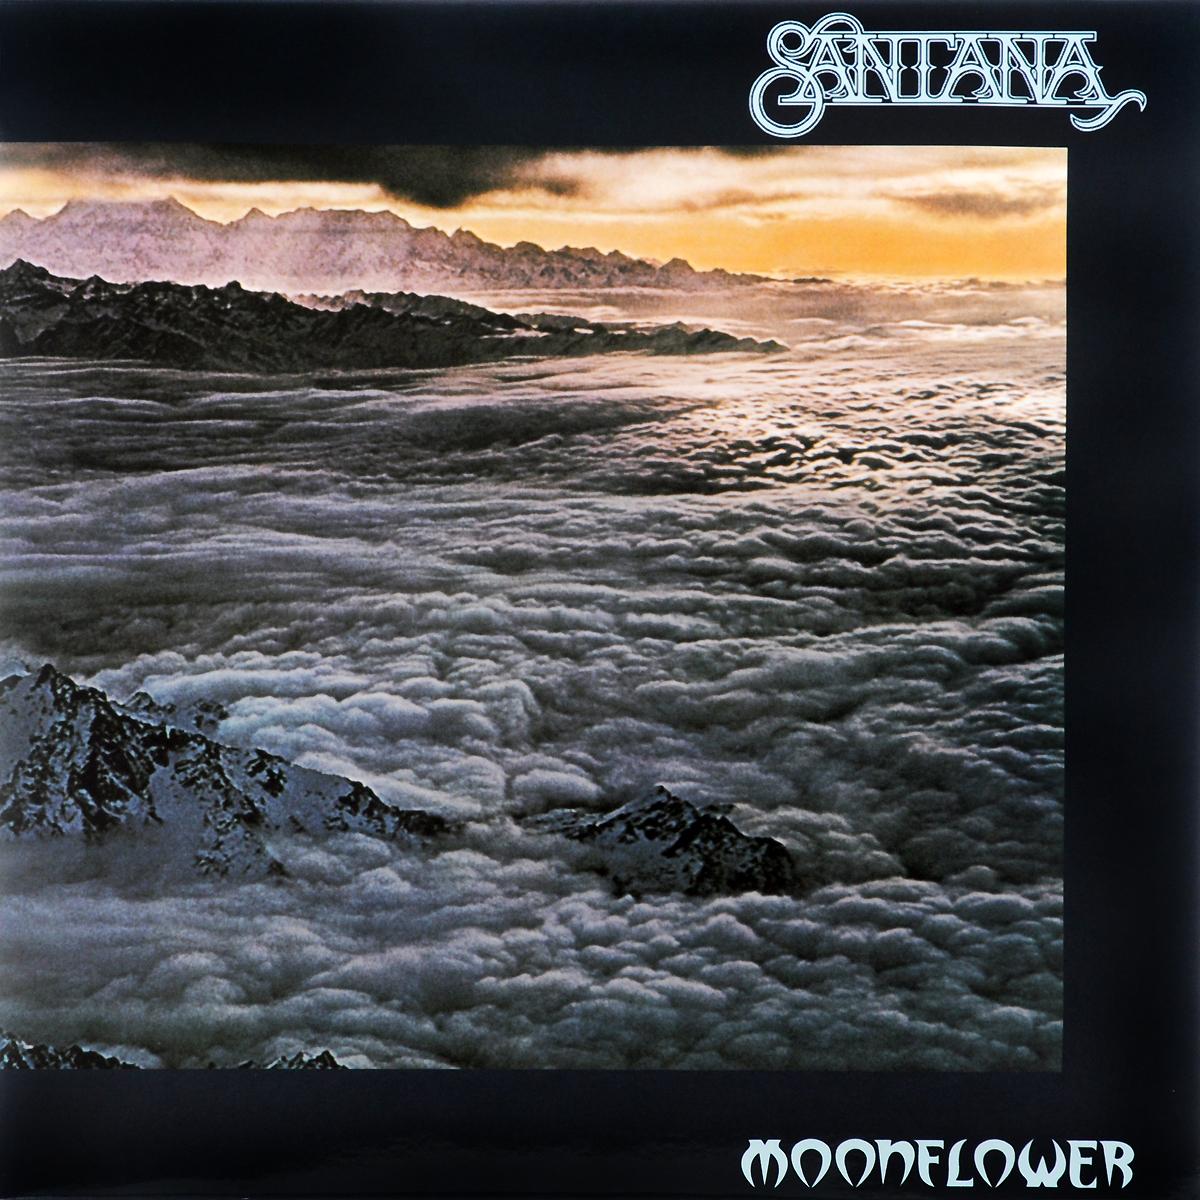 Карлос Сантана Santana. Moonflowe (2 LP) карлос сантана santana ultimate santana